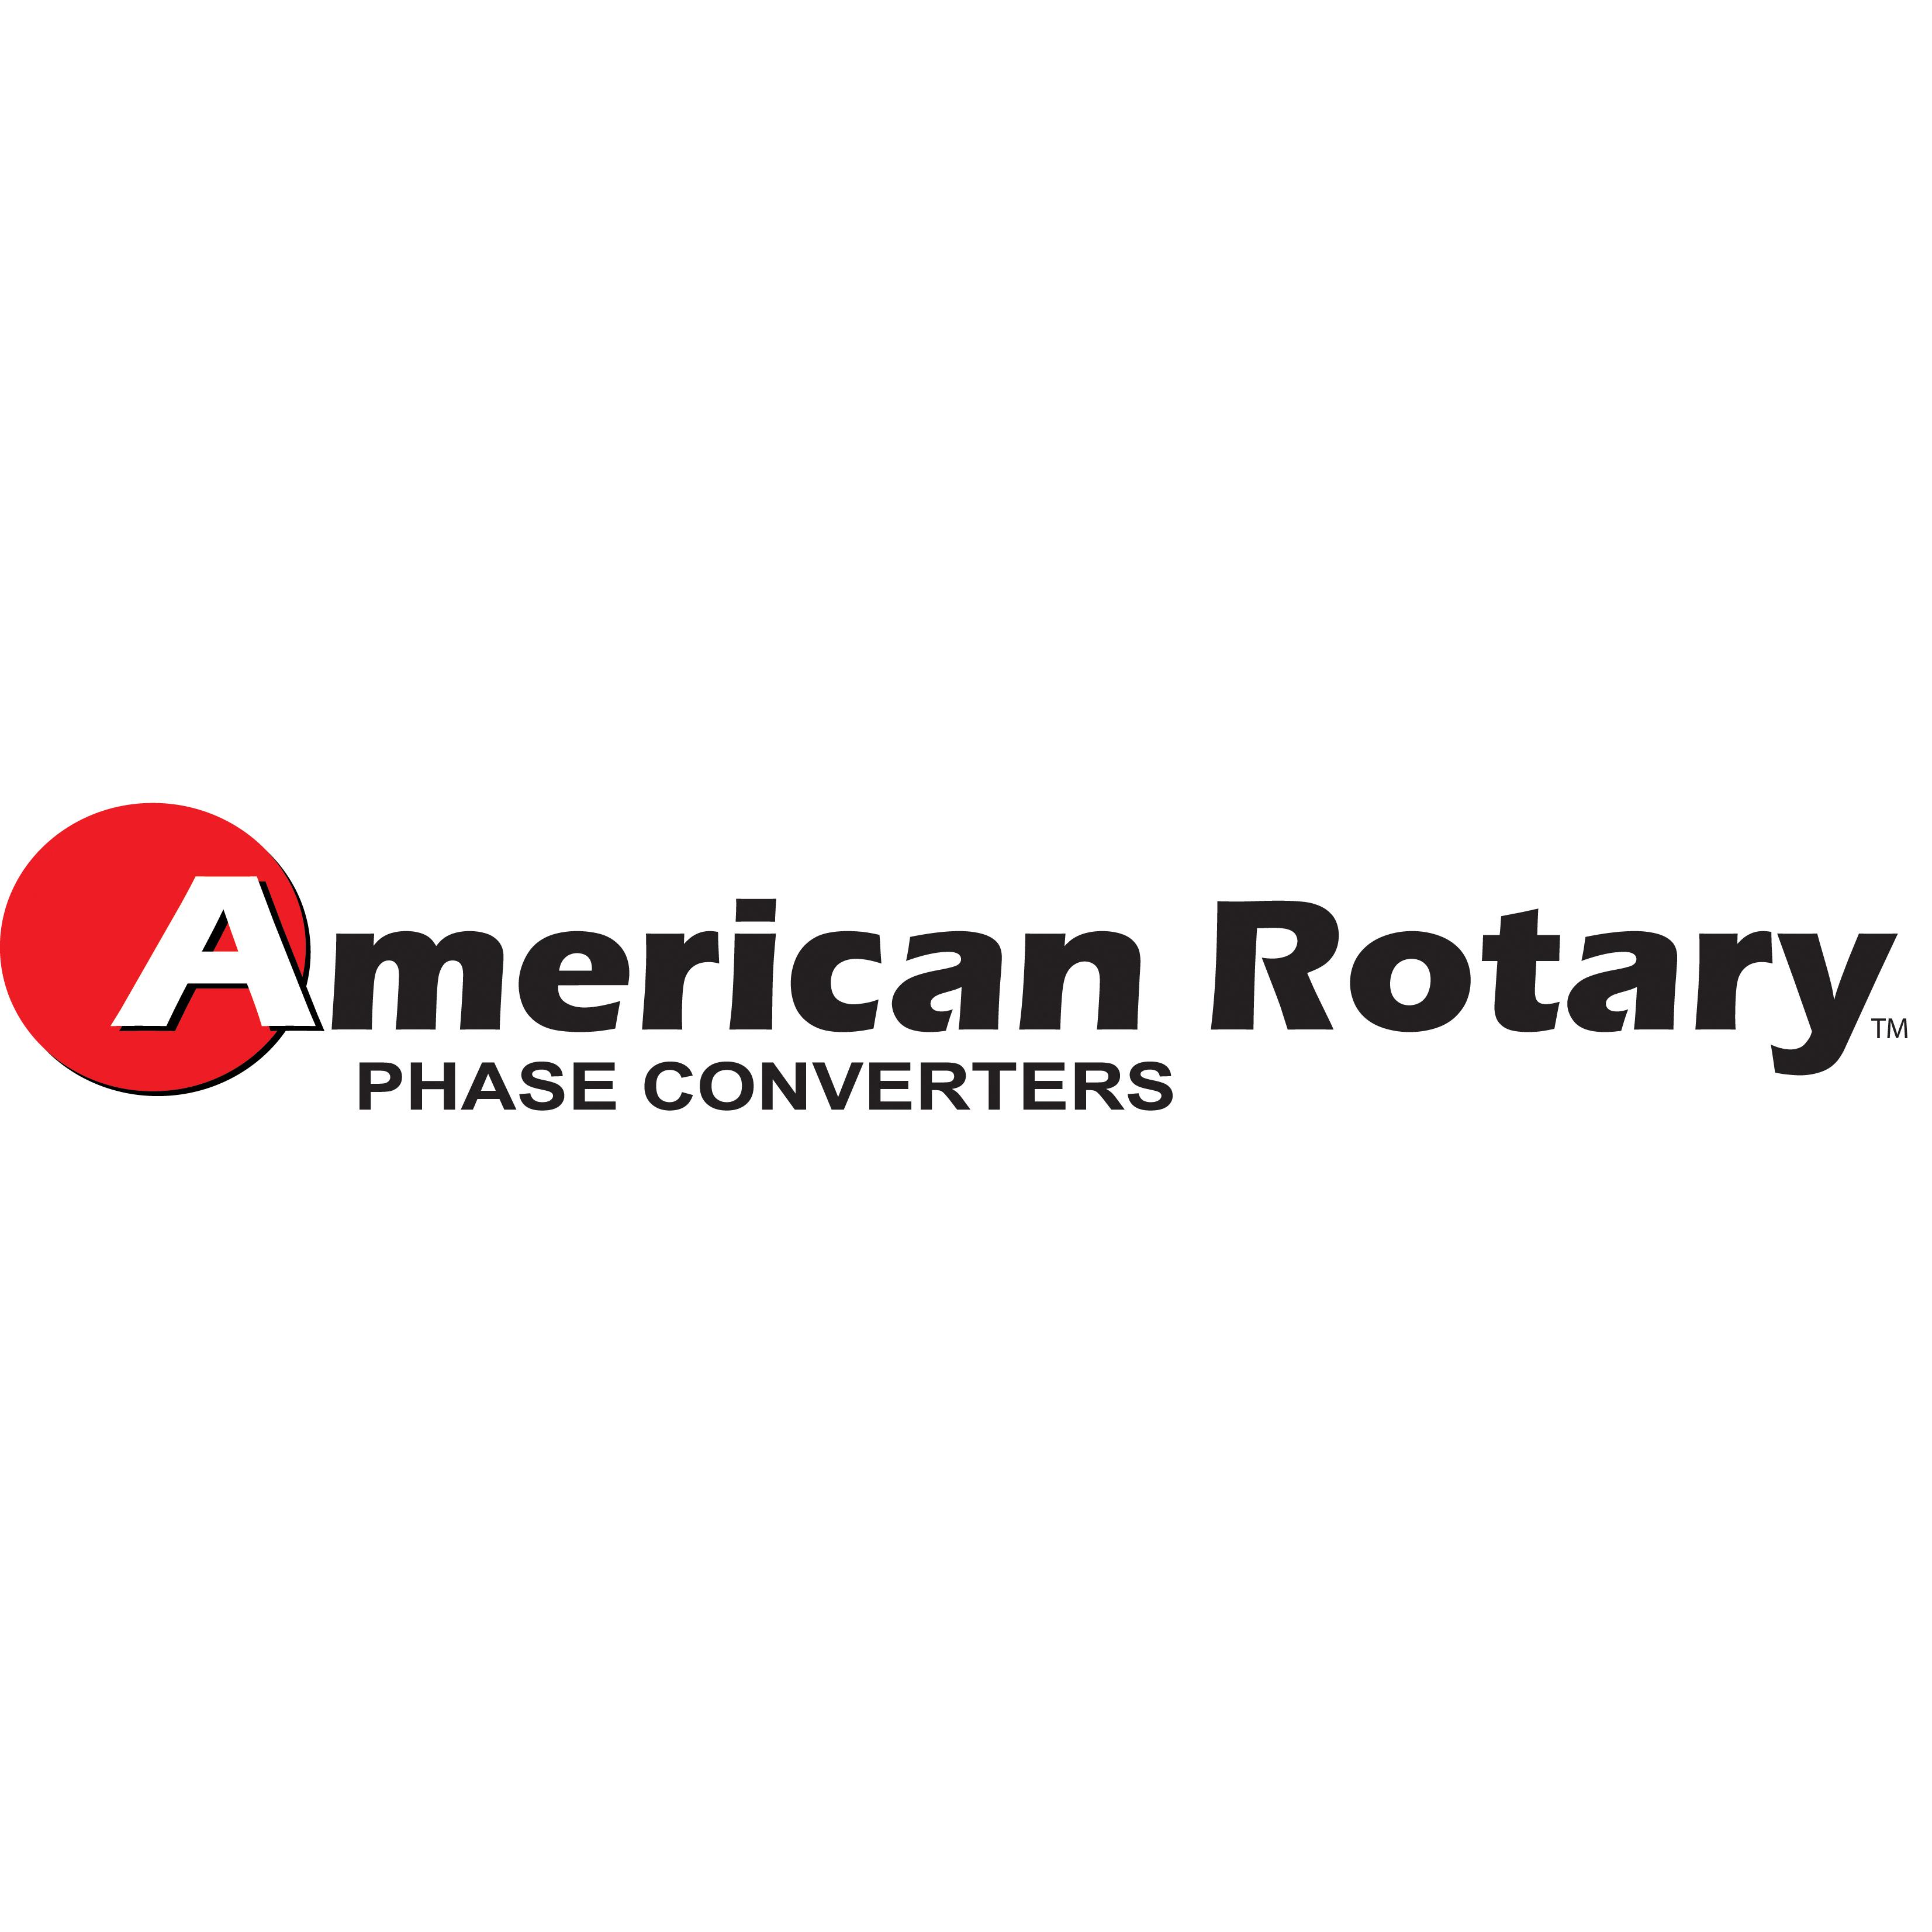 American Rotary